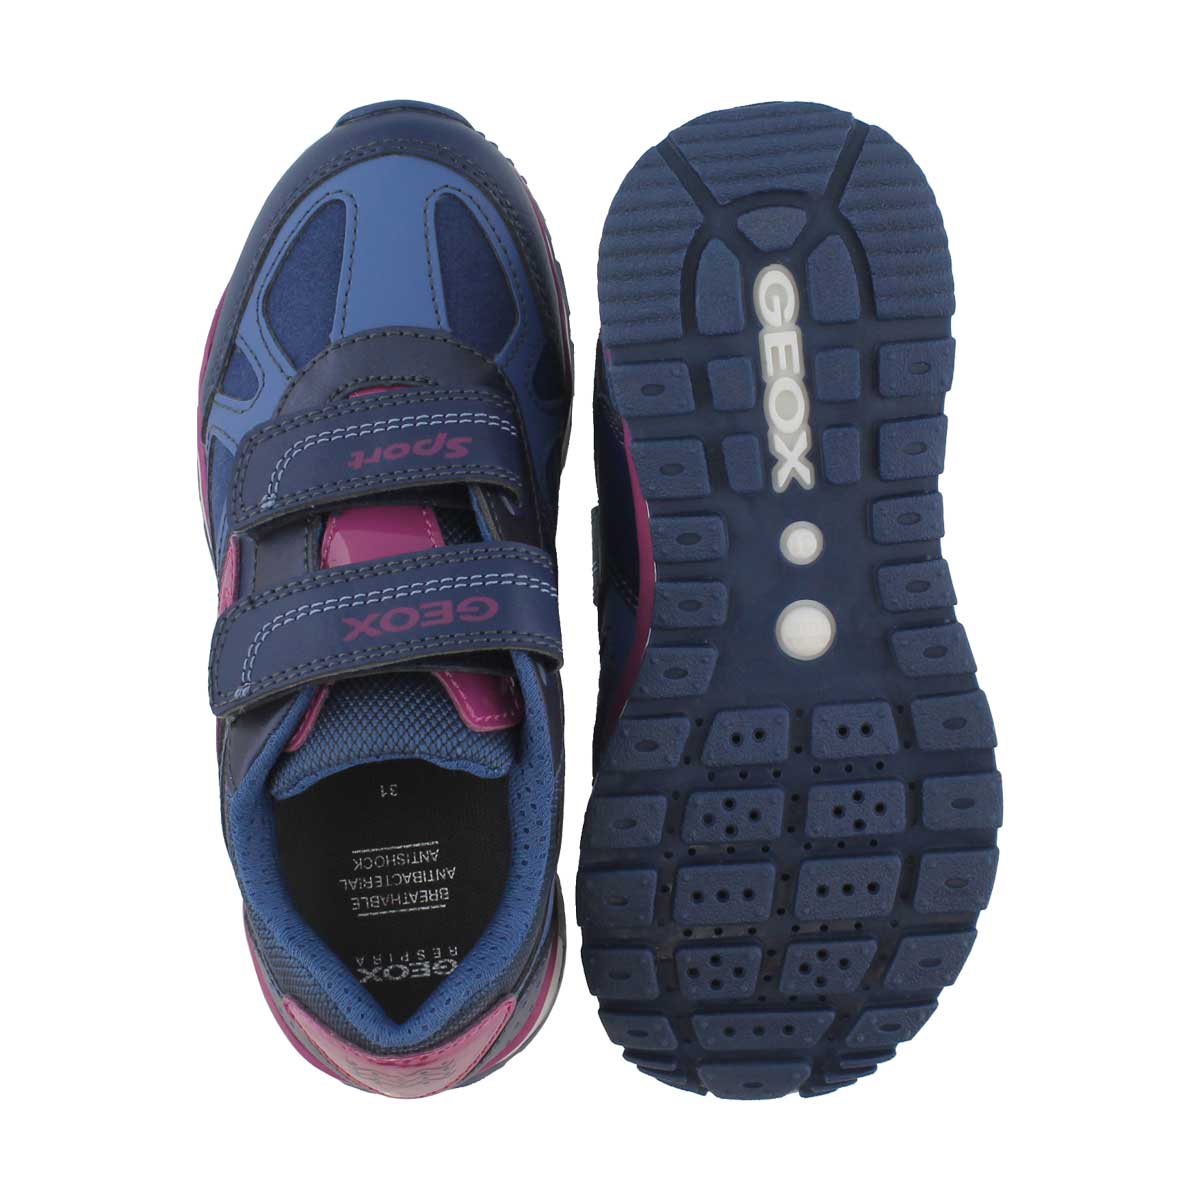 Grls Pavel A nvy/fus 2 strap sneaker